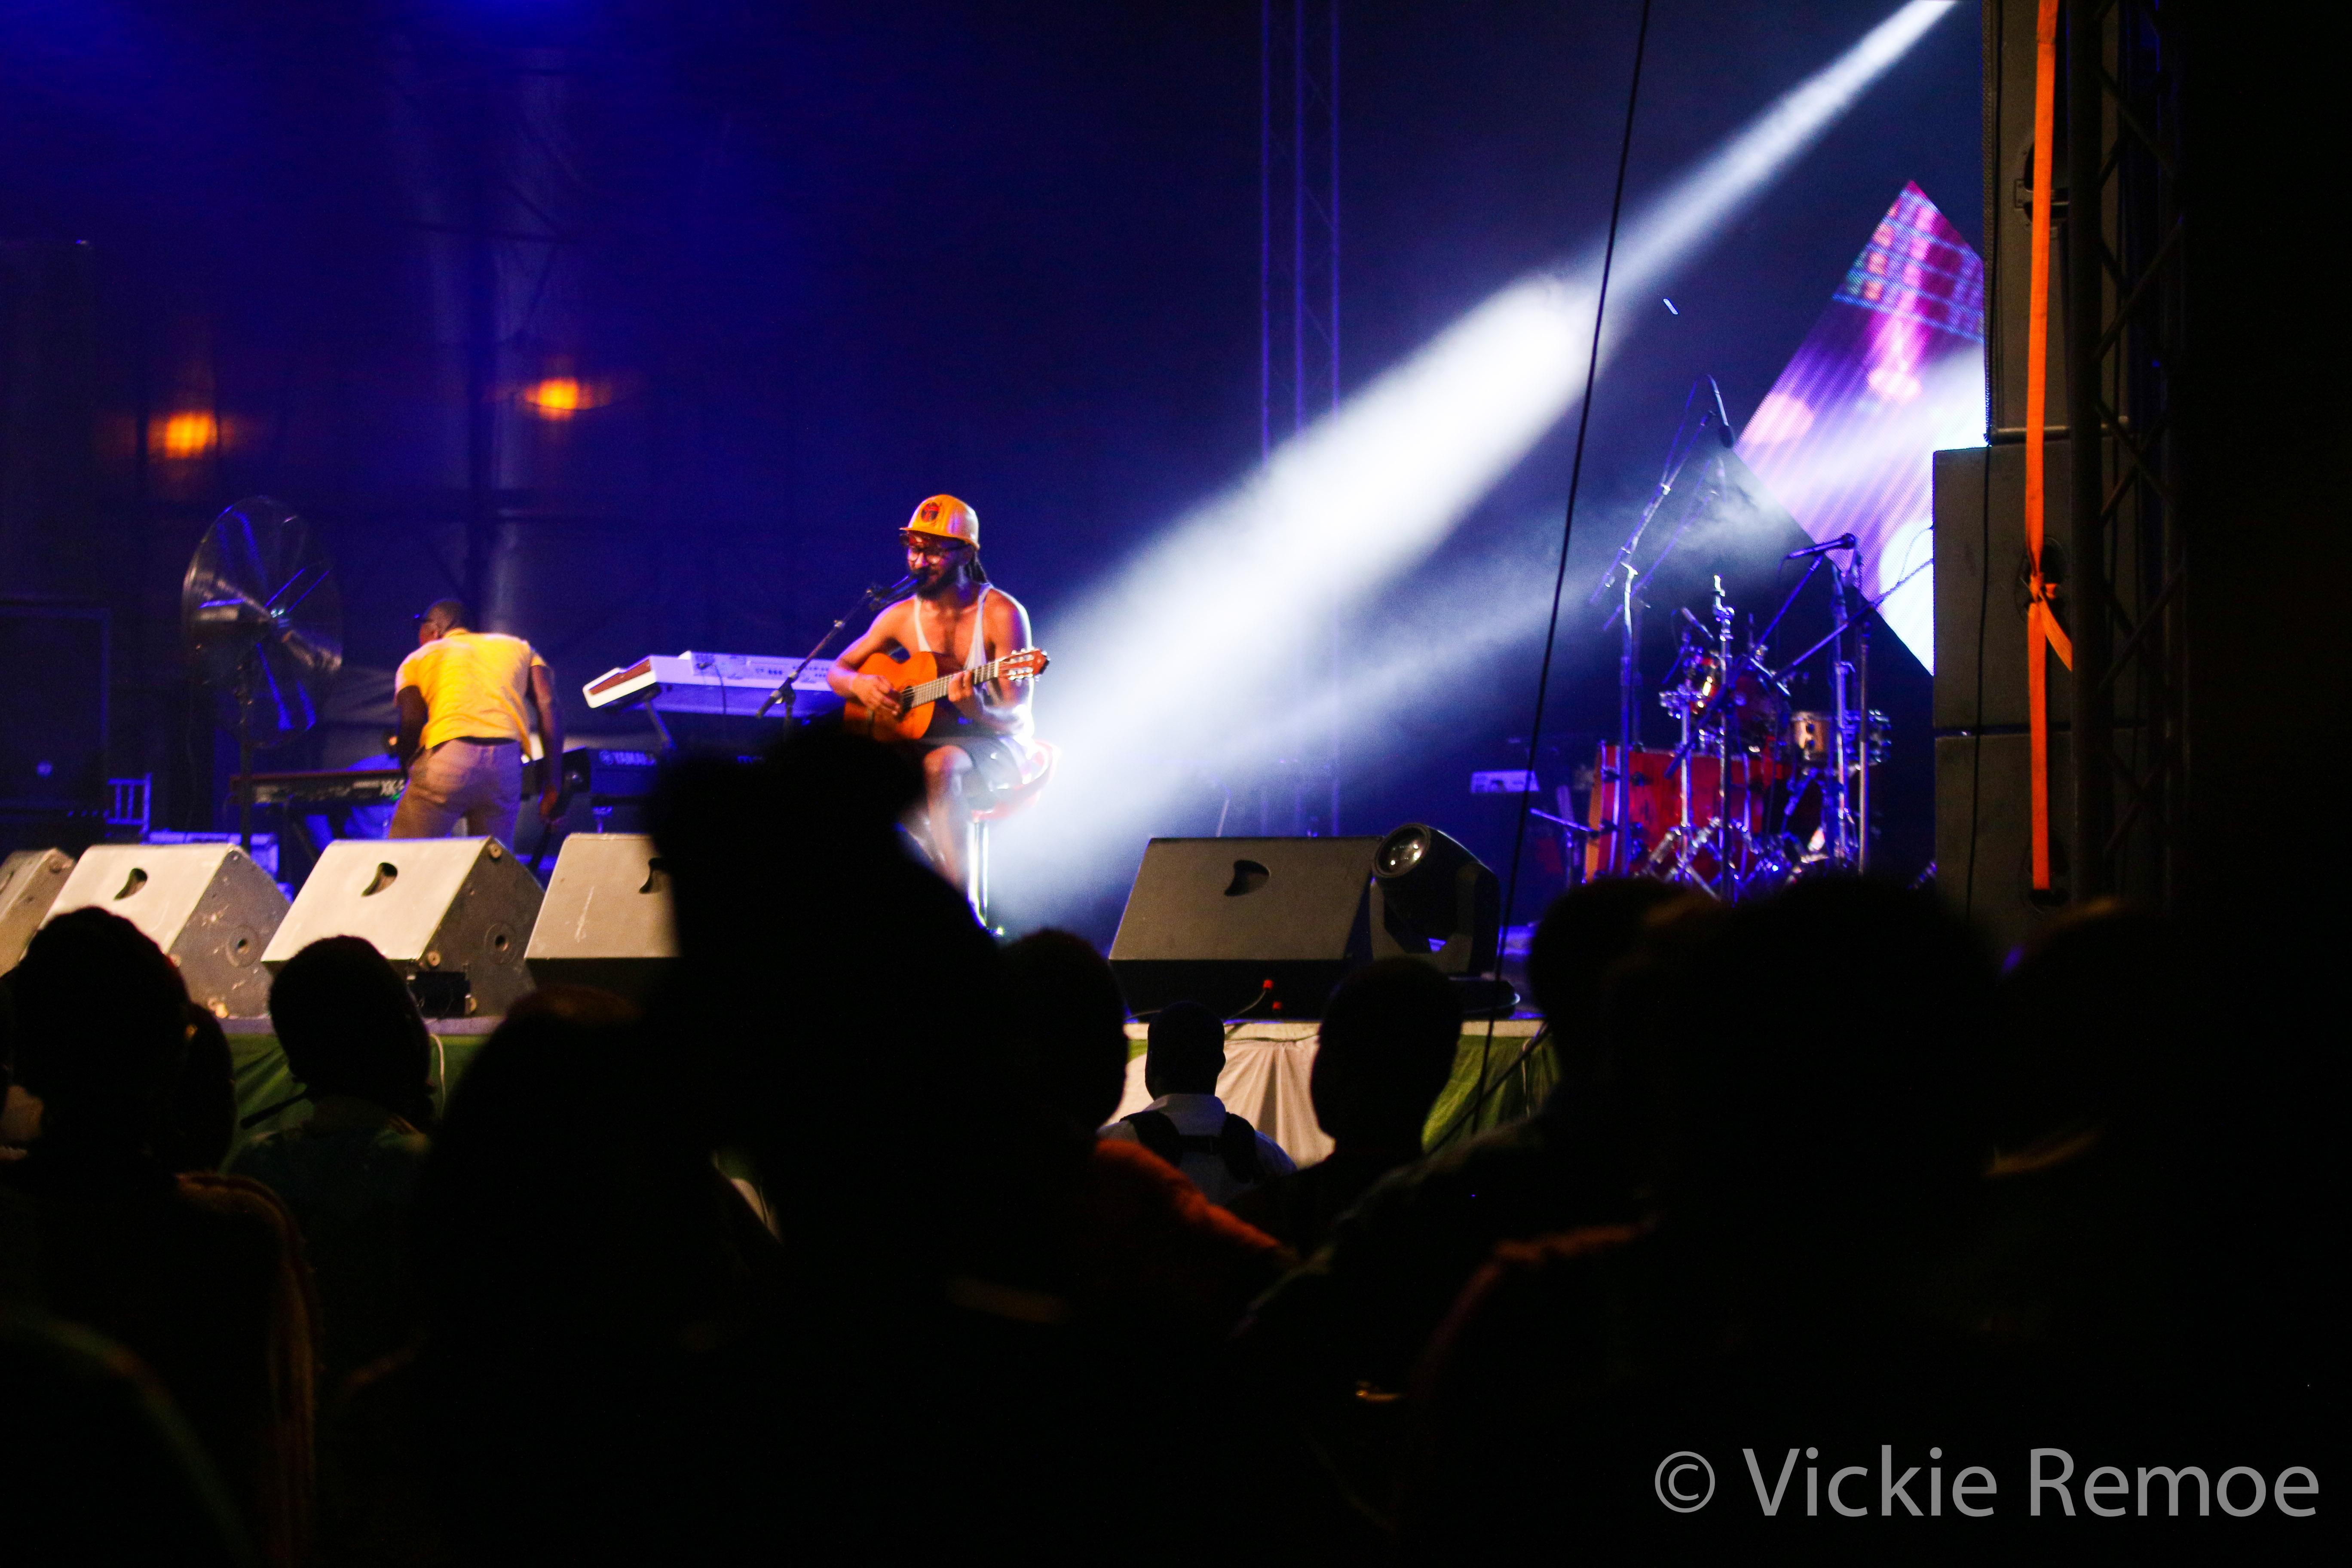 LaurynHillinGhana_Wanlov_BBNZ-Concert_StoneBoy-MissV-2014-4